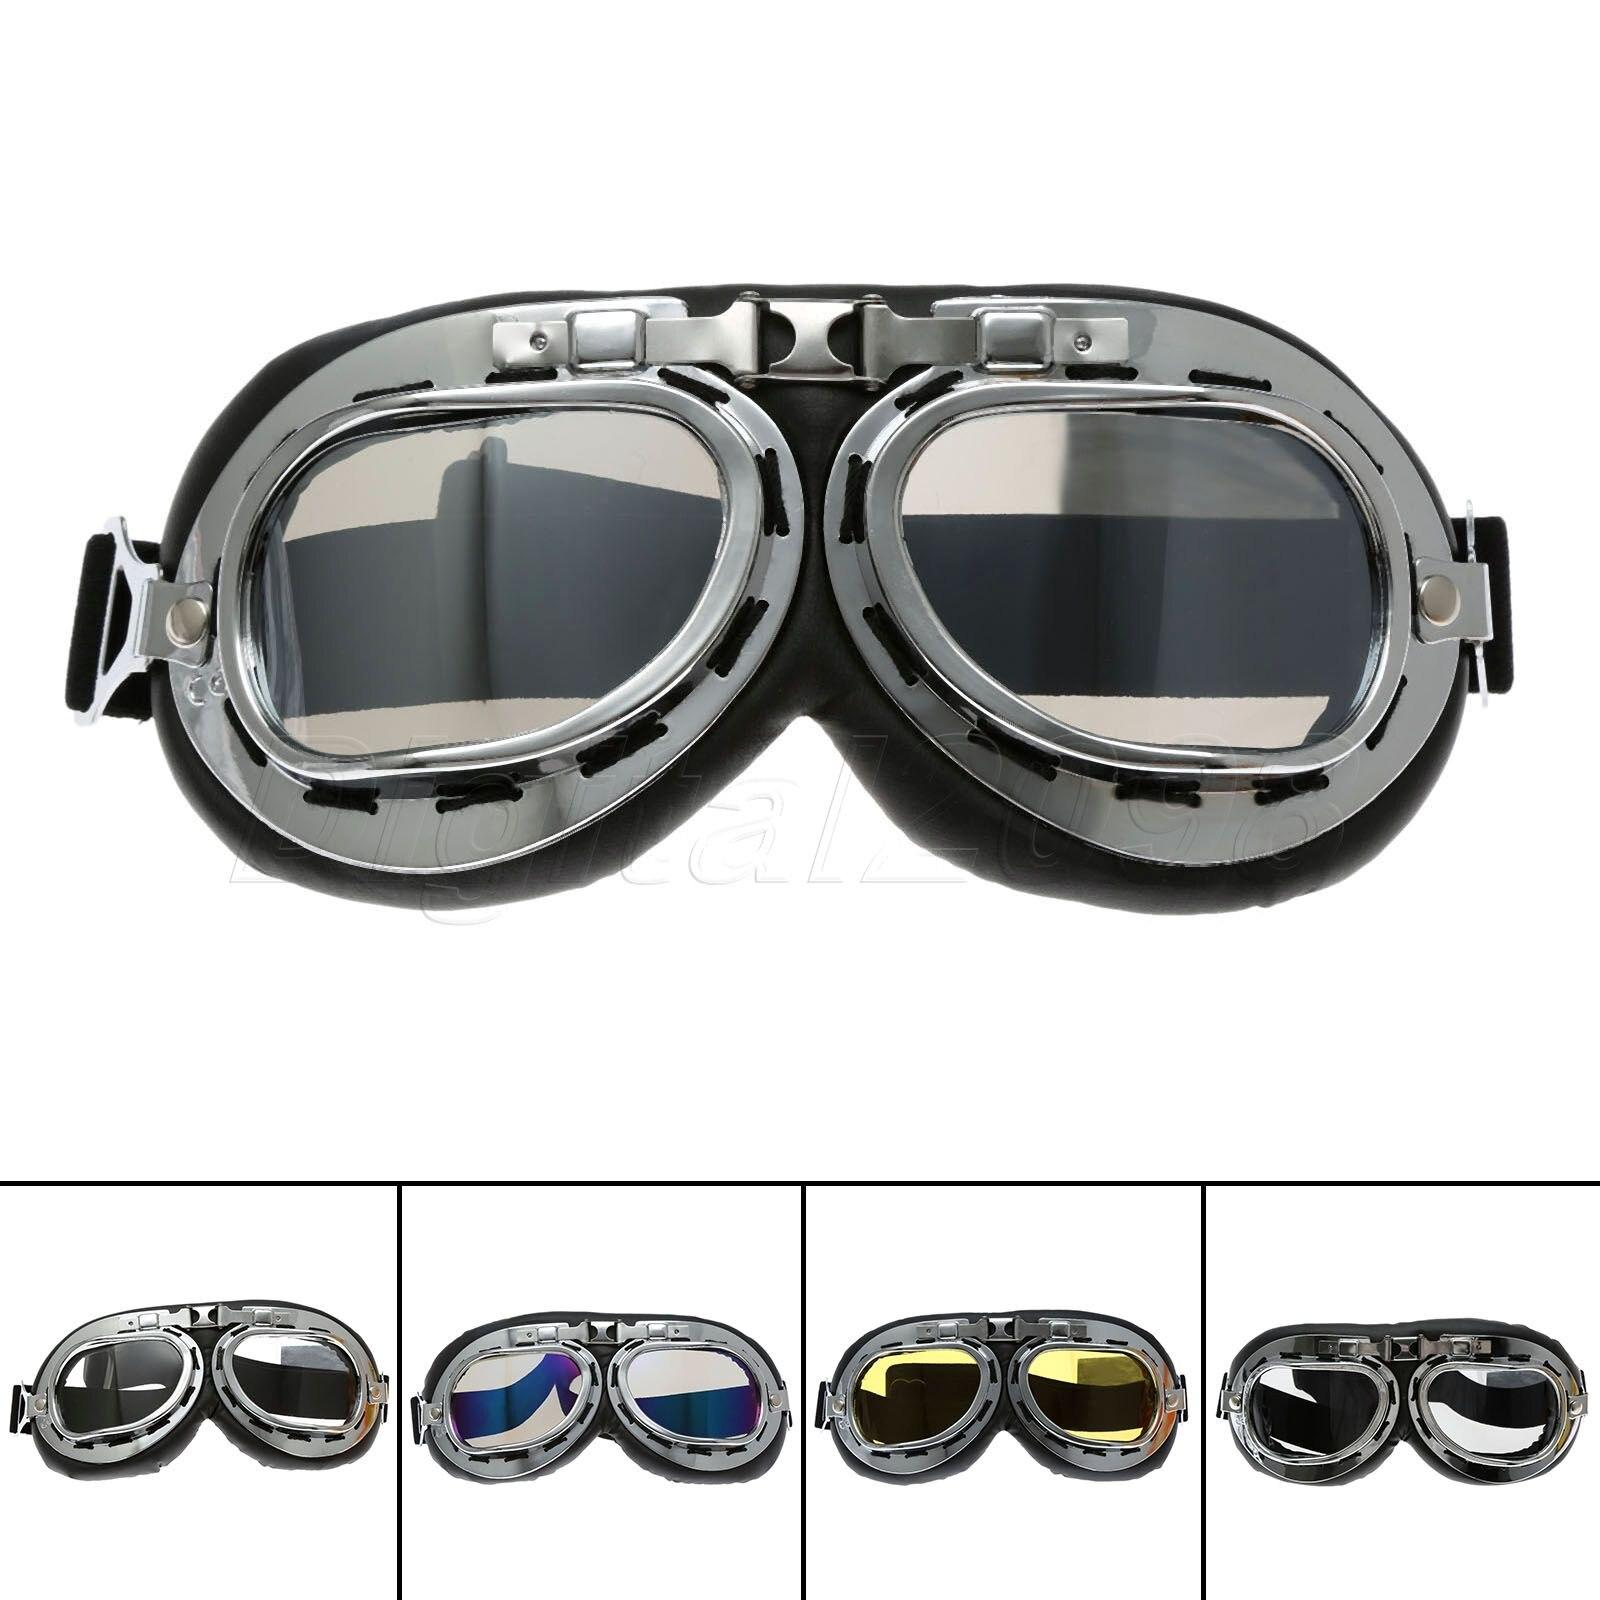 Yetaha Vintage Pilot Motorcycle Goggles Motocross ATV Dirt Biker Cruiser WWII RAF Glasses Smoked Lens